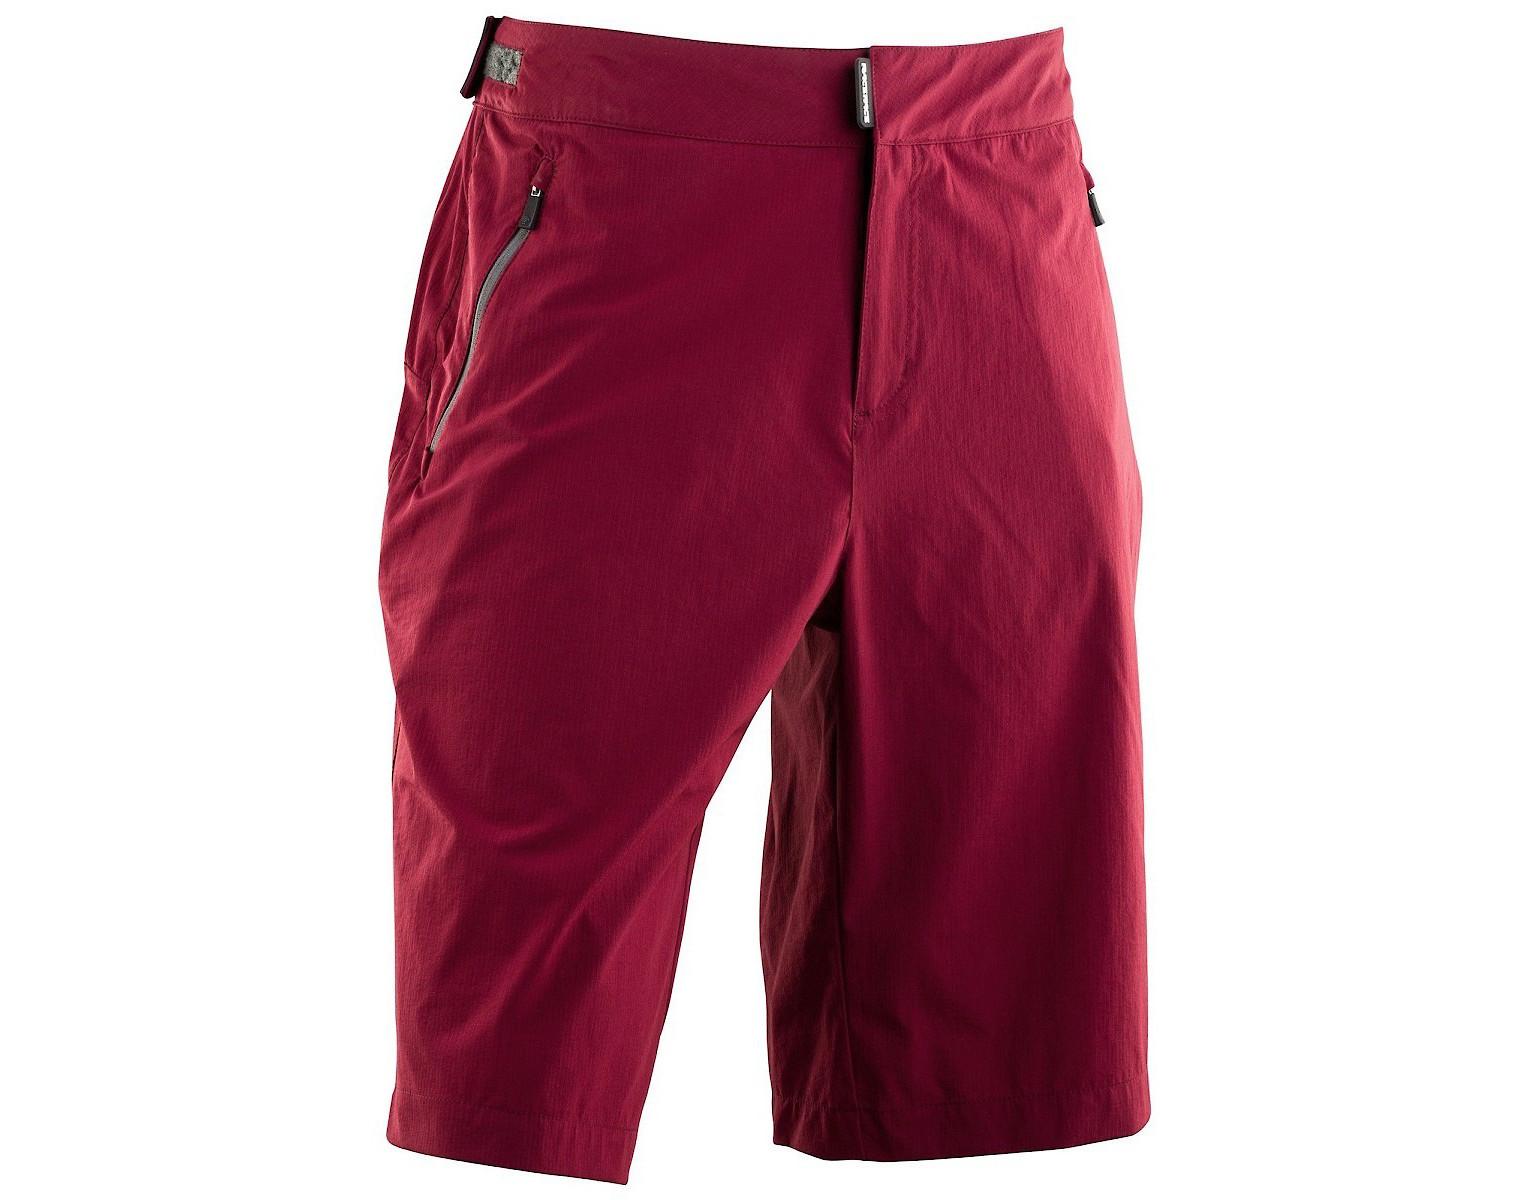 Podium shorts - Port (SS17)